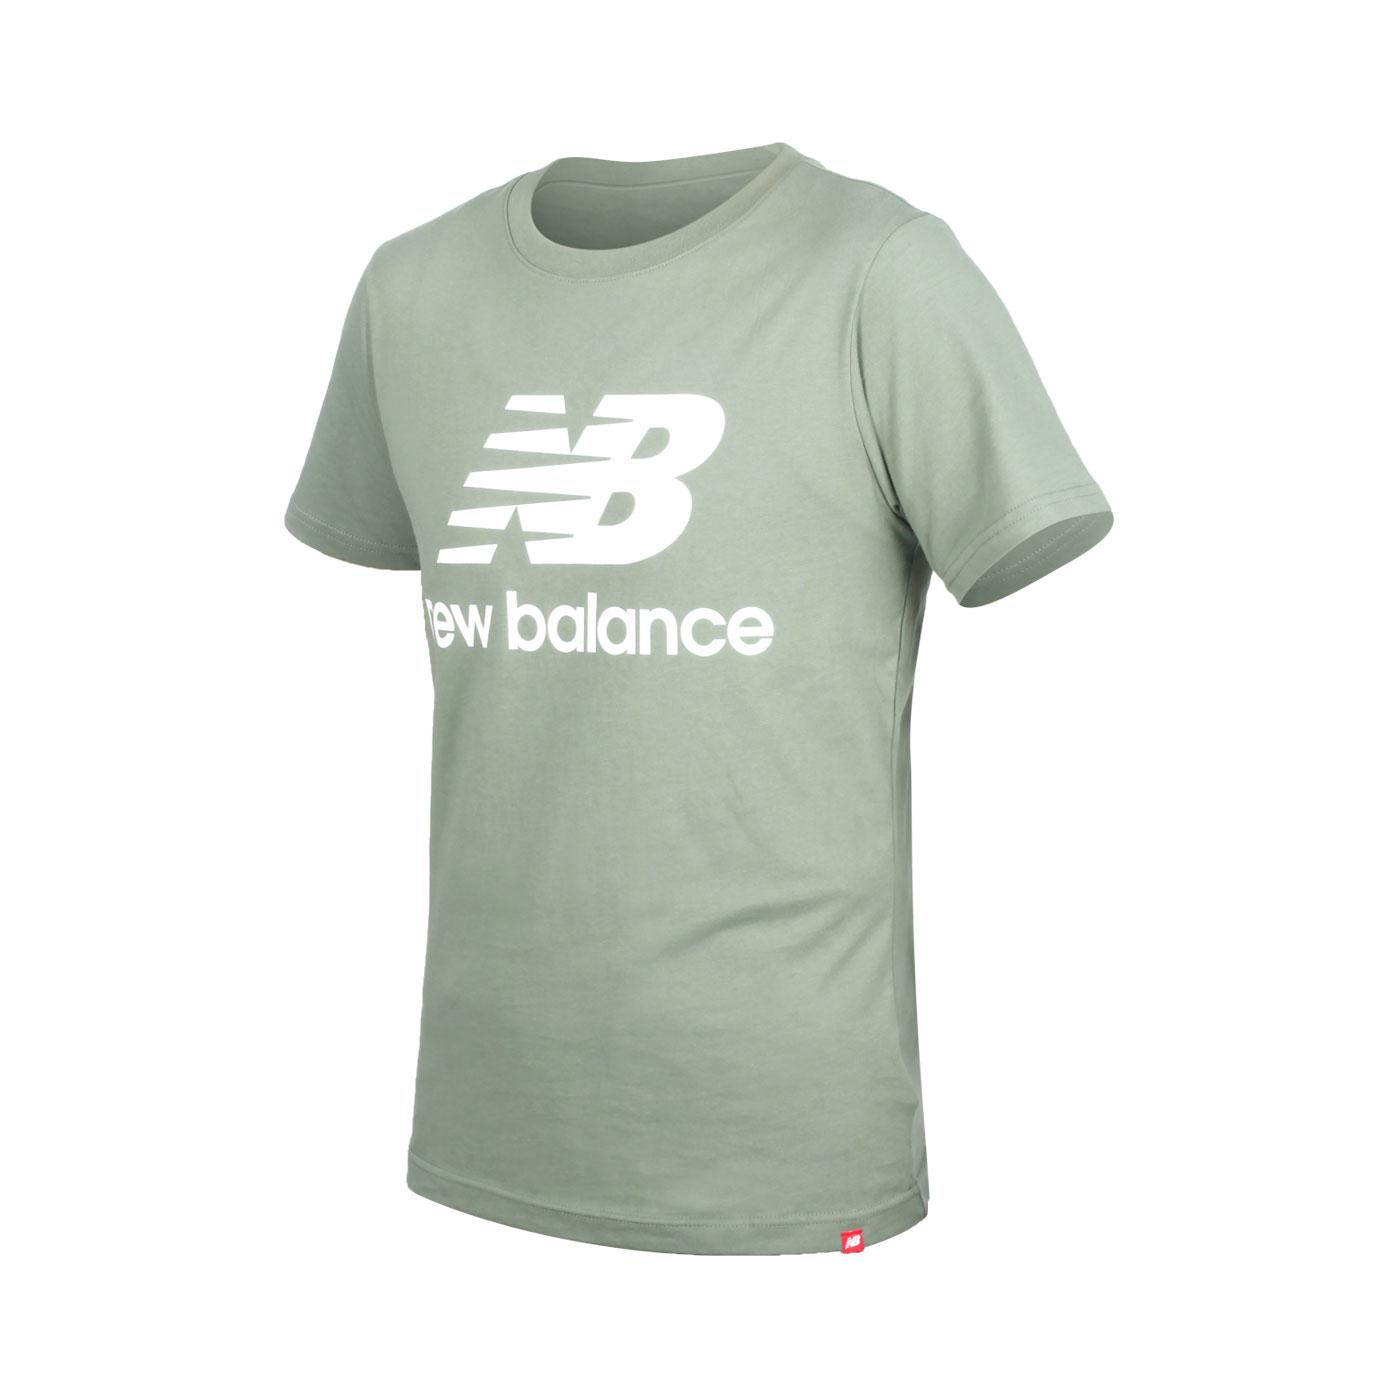 NEW BALANCE 男款短袖T恤 AMT01575CEL